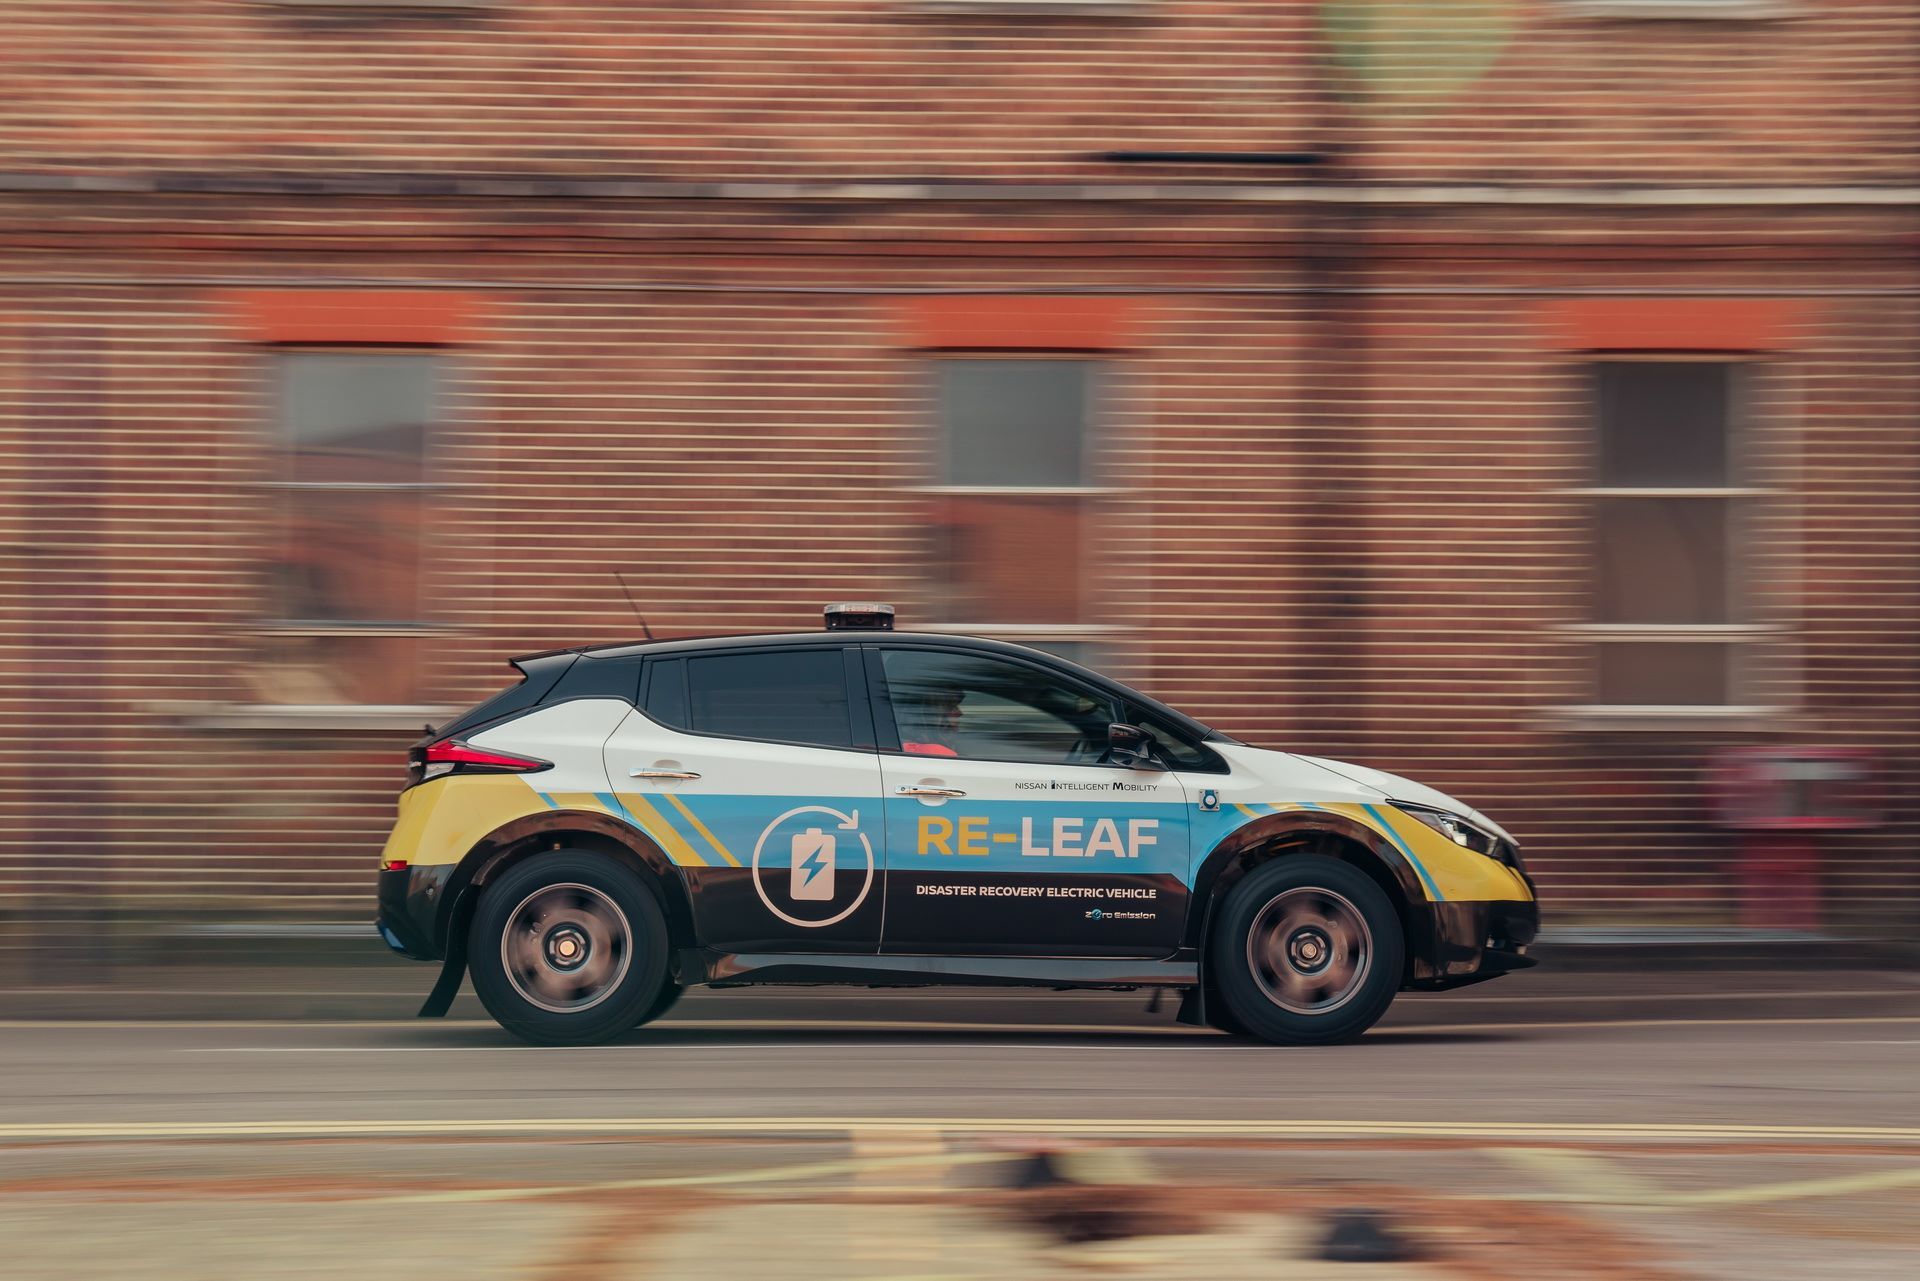 Nissan-Re-Leaf-Concept-5